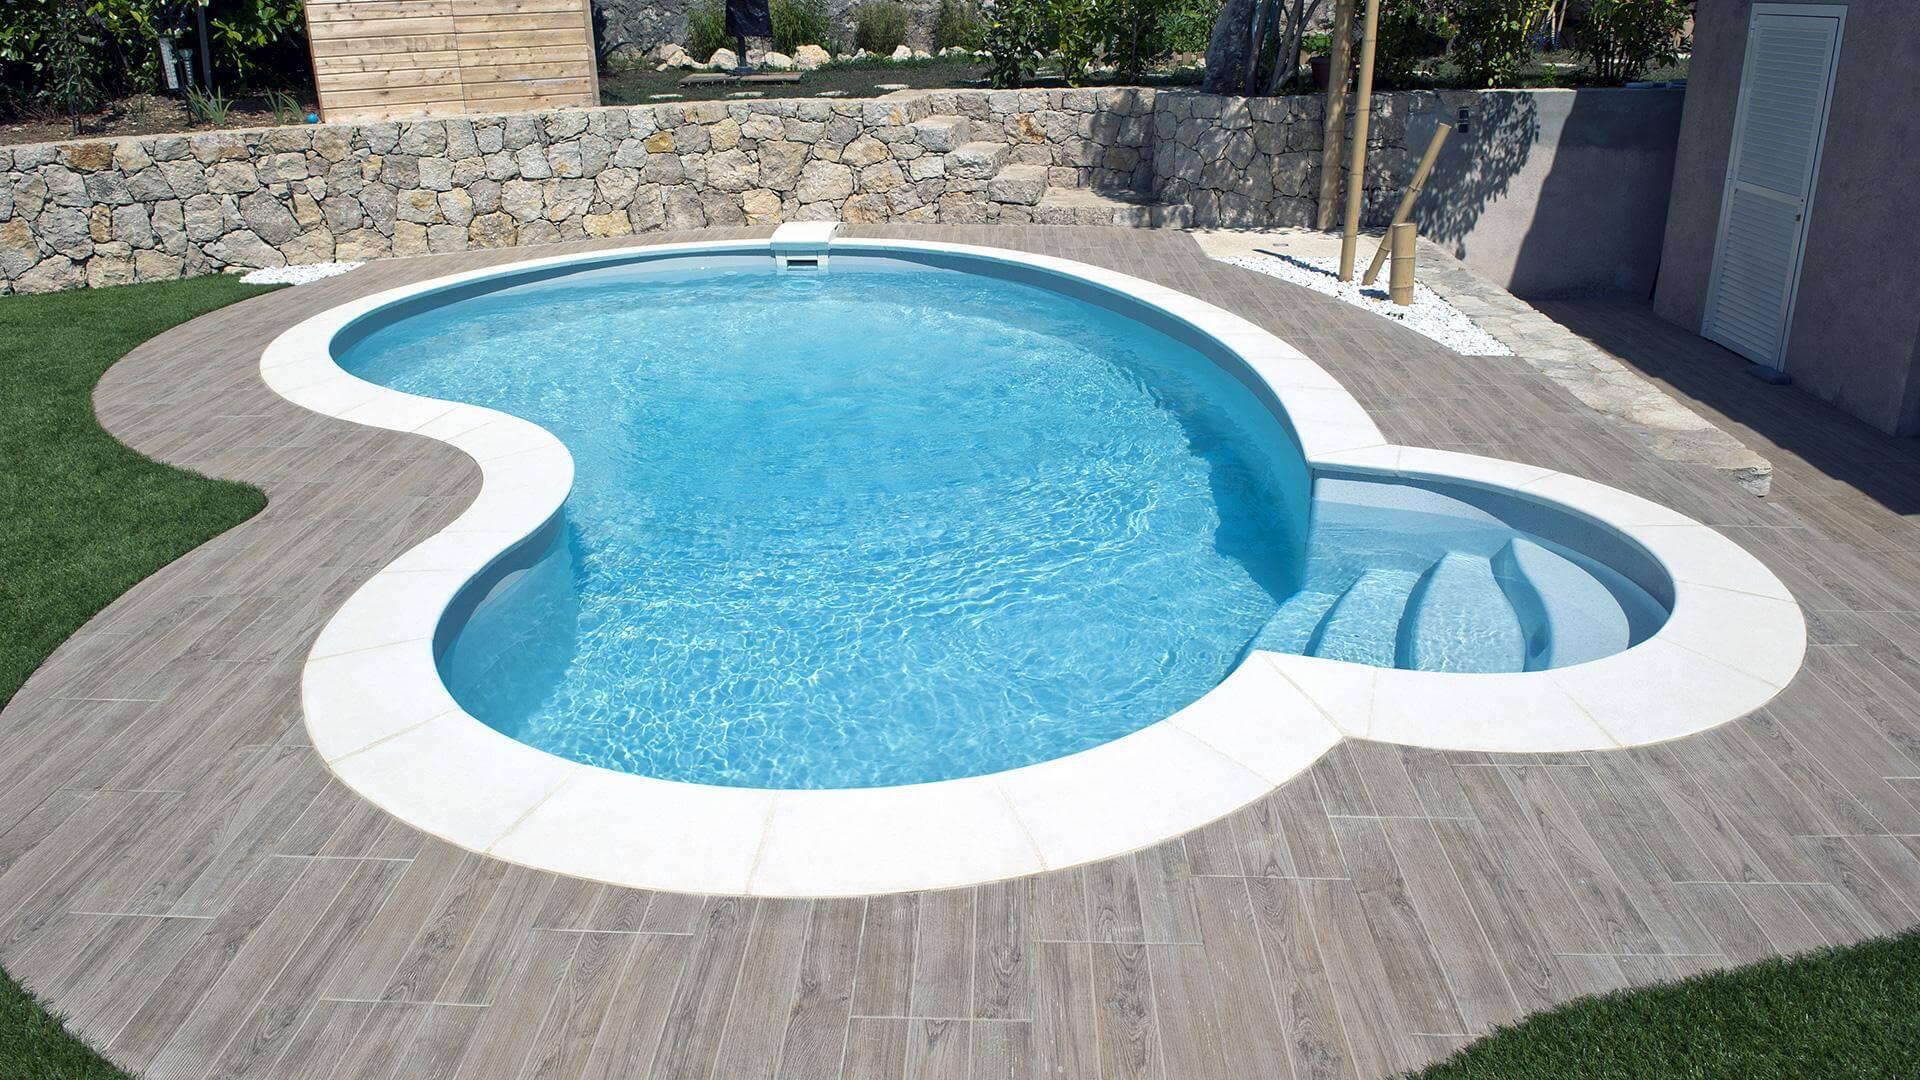 piscine haricot cline - Piscine Haricot Prix